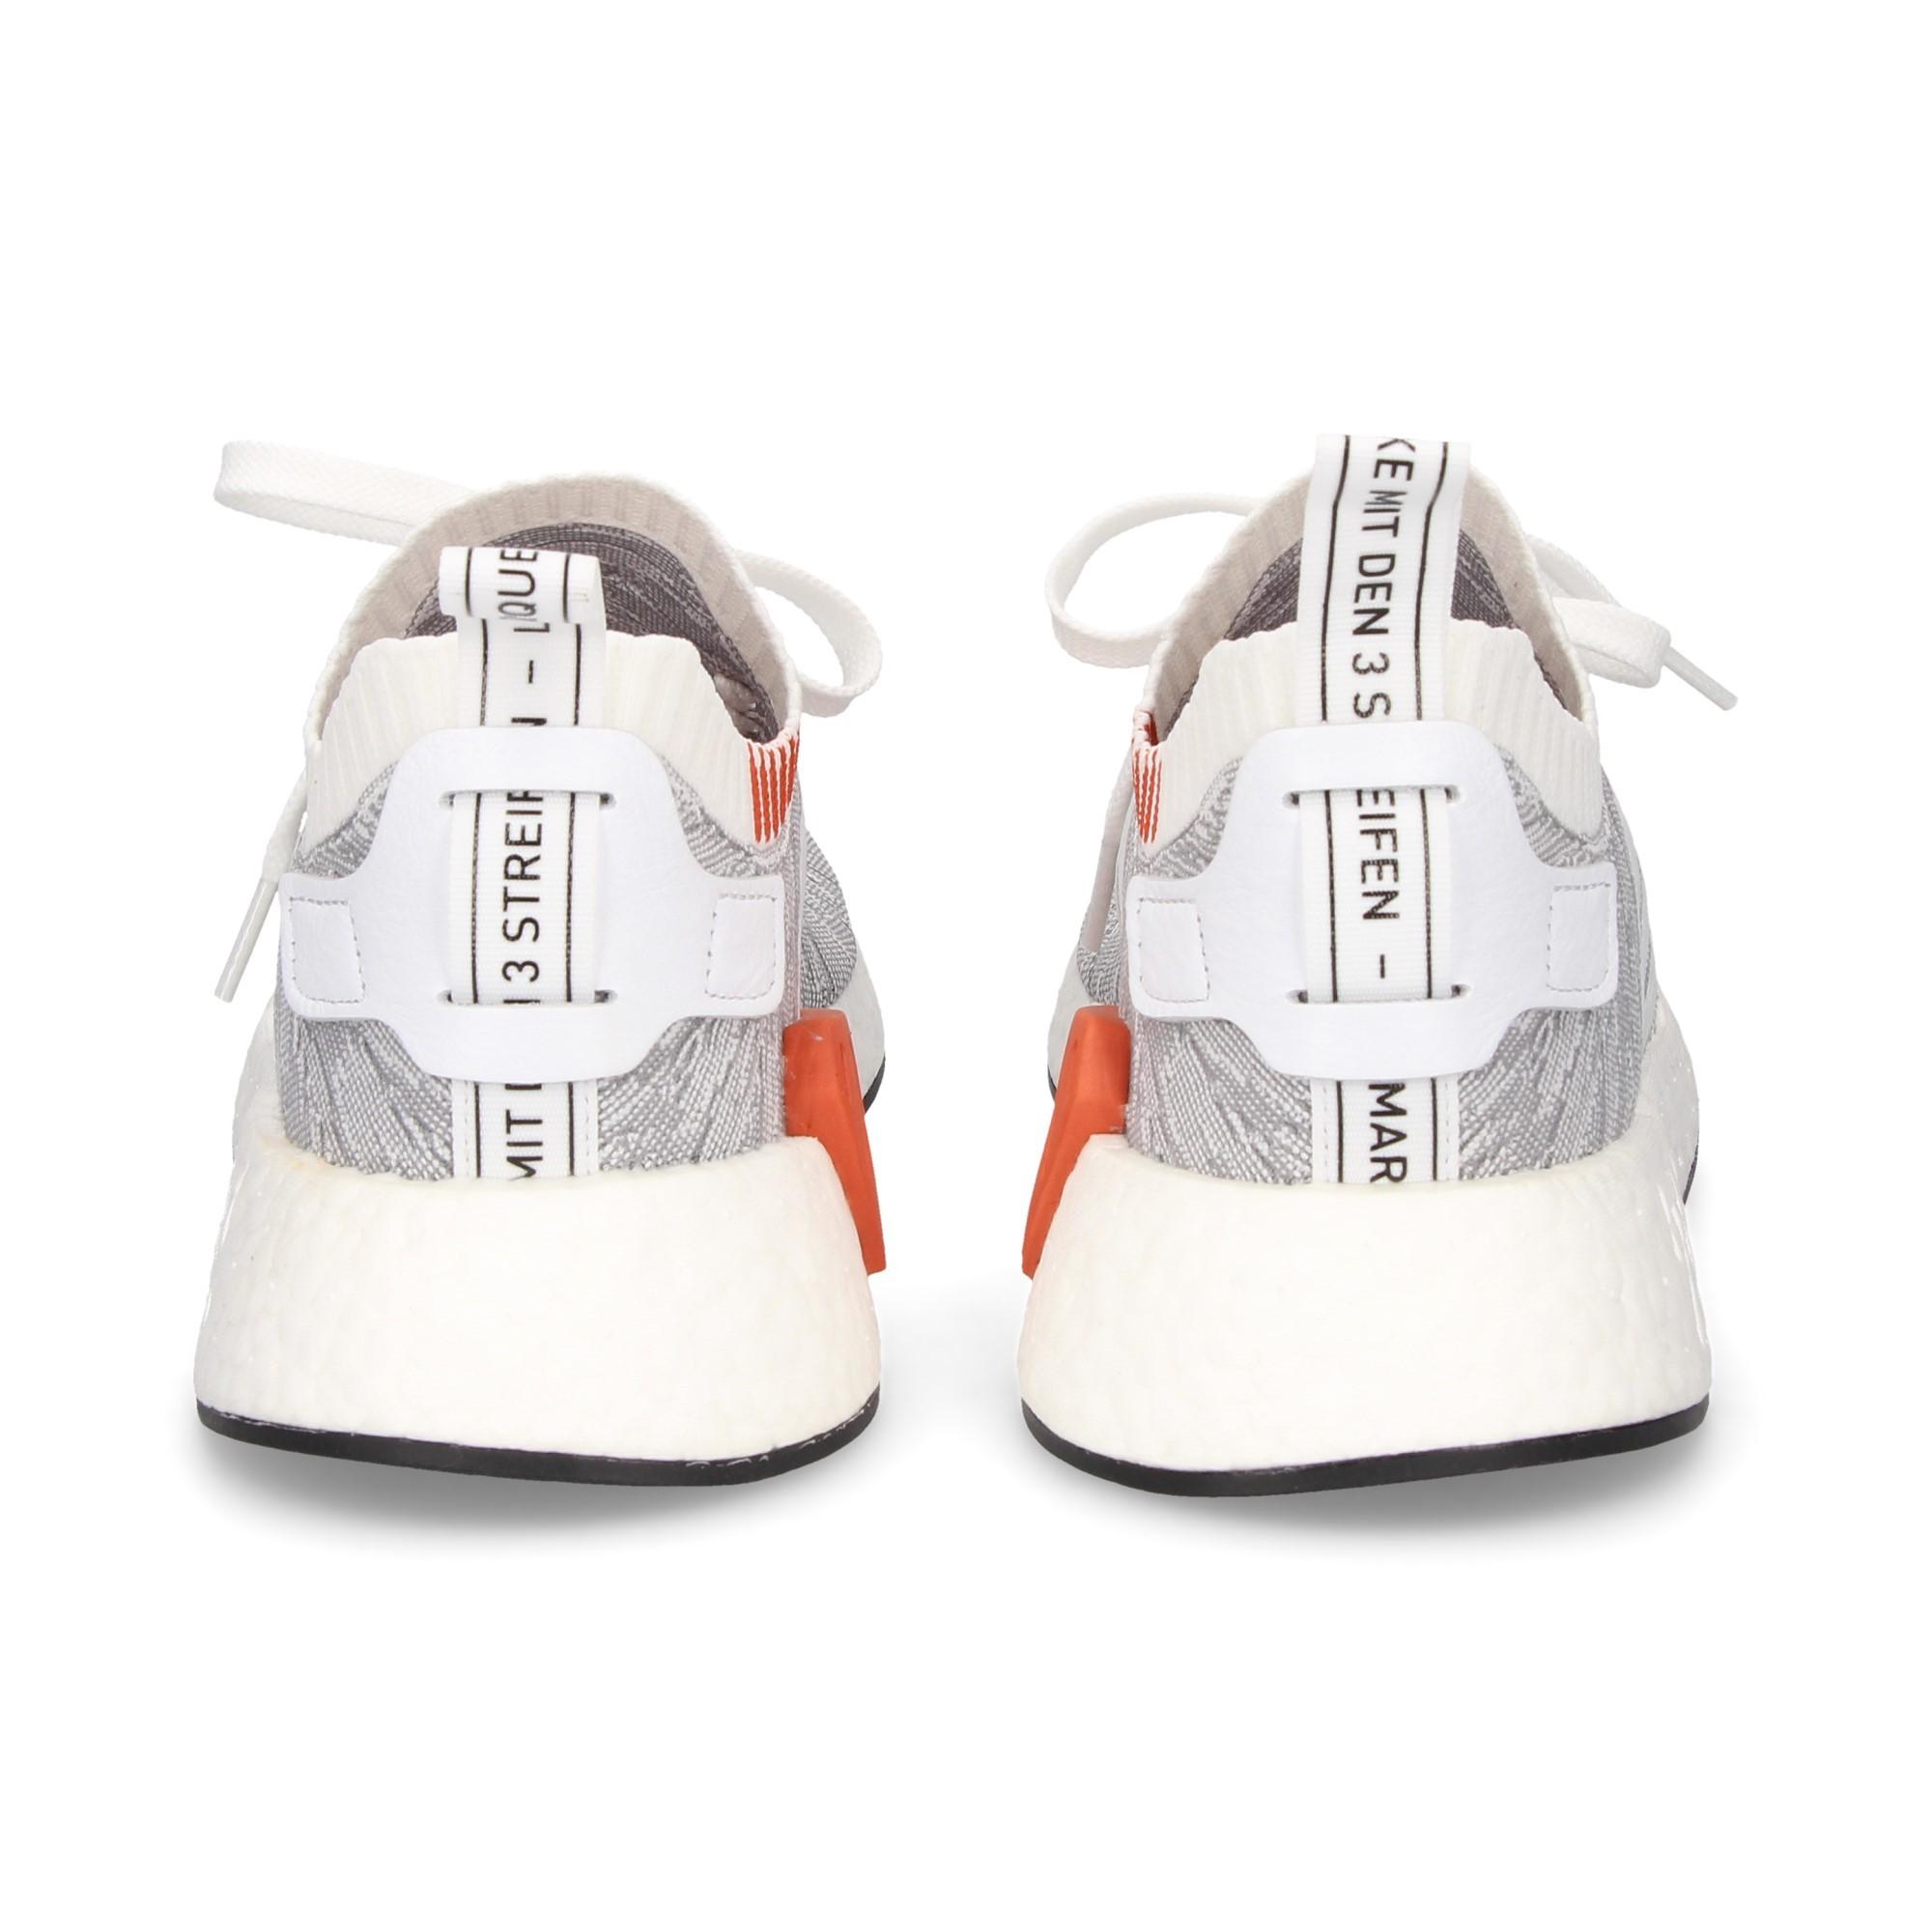 deportivo-cordones-3-rayas-gris